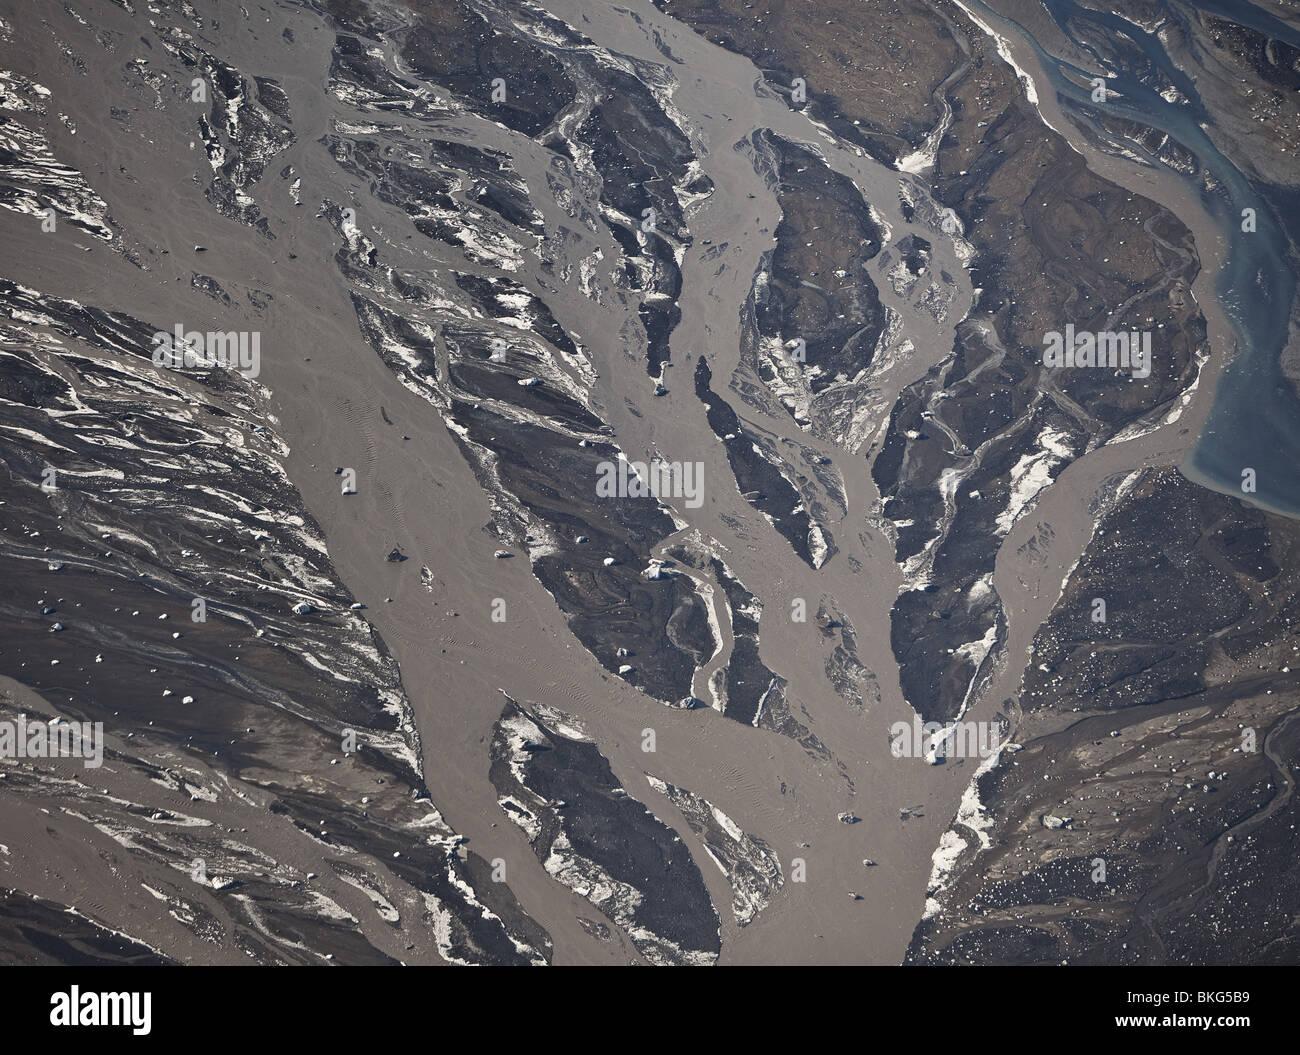 Río Markarfljot con cenizas justo al norte de Eyjafjalljokull erupción volcánica Imagen De Stock